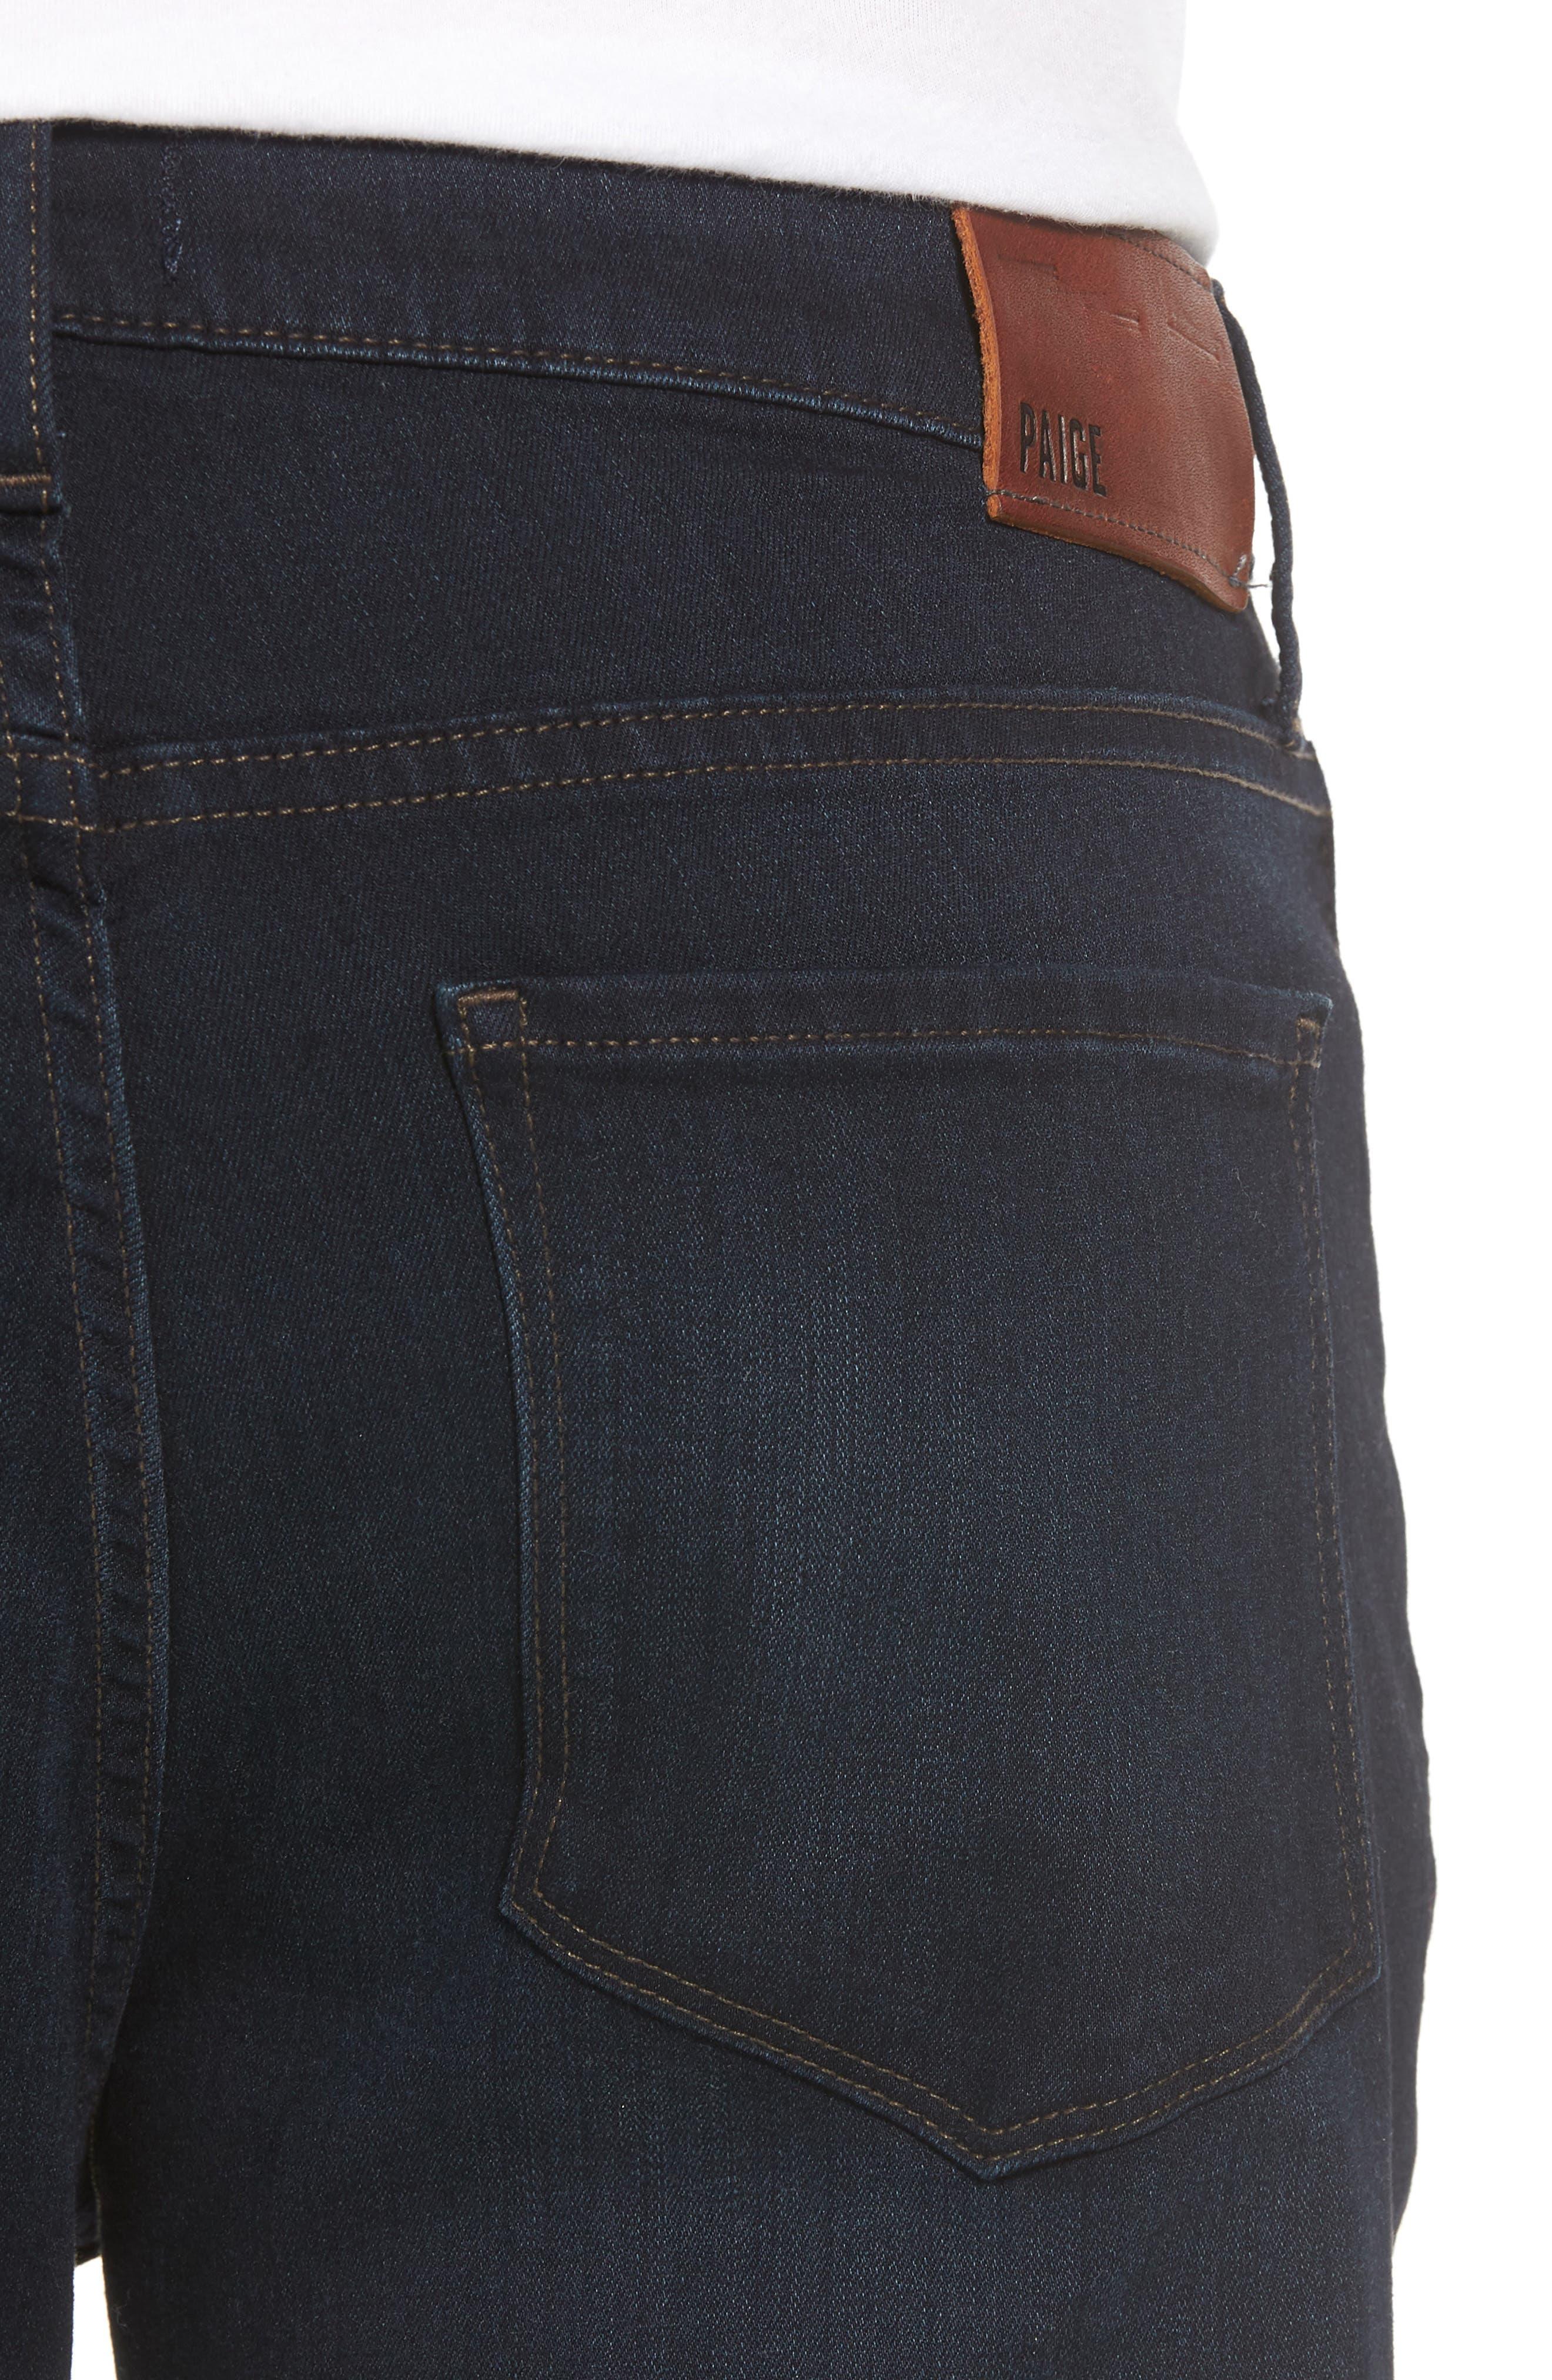 Normandie Straight Leg Jeans,                             Alternate thumbnail 4, color,                             FLEET